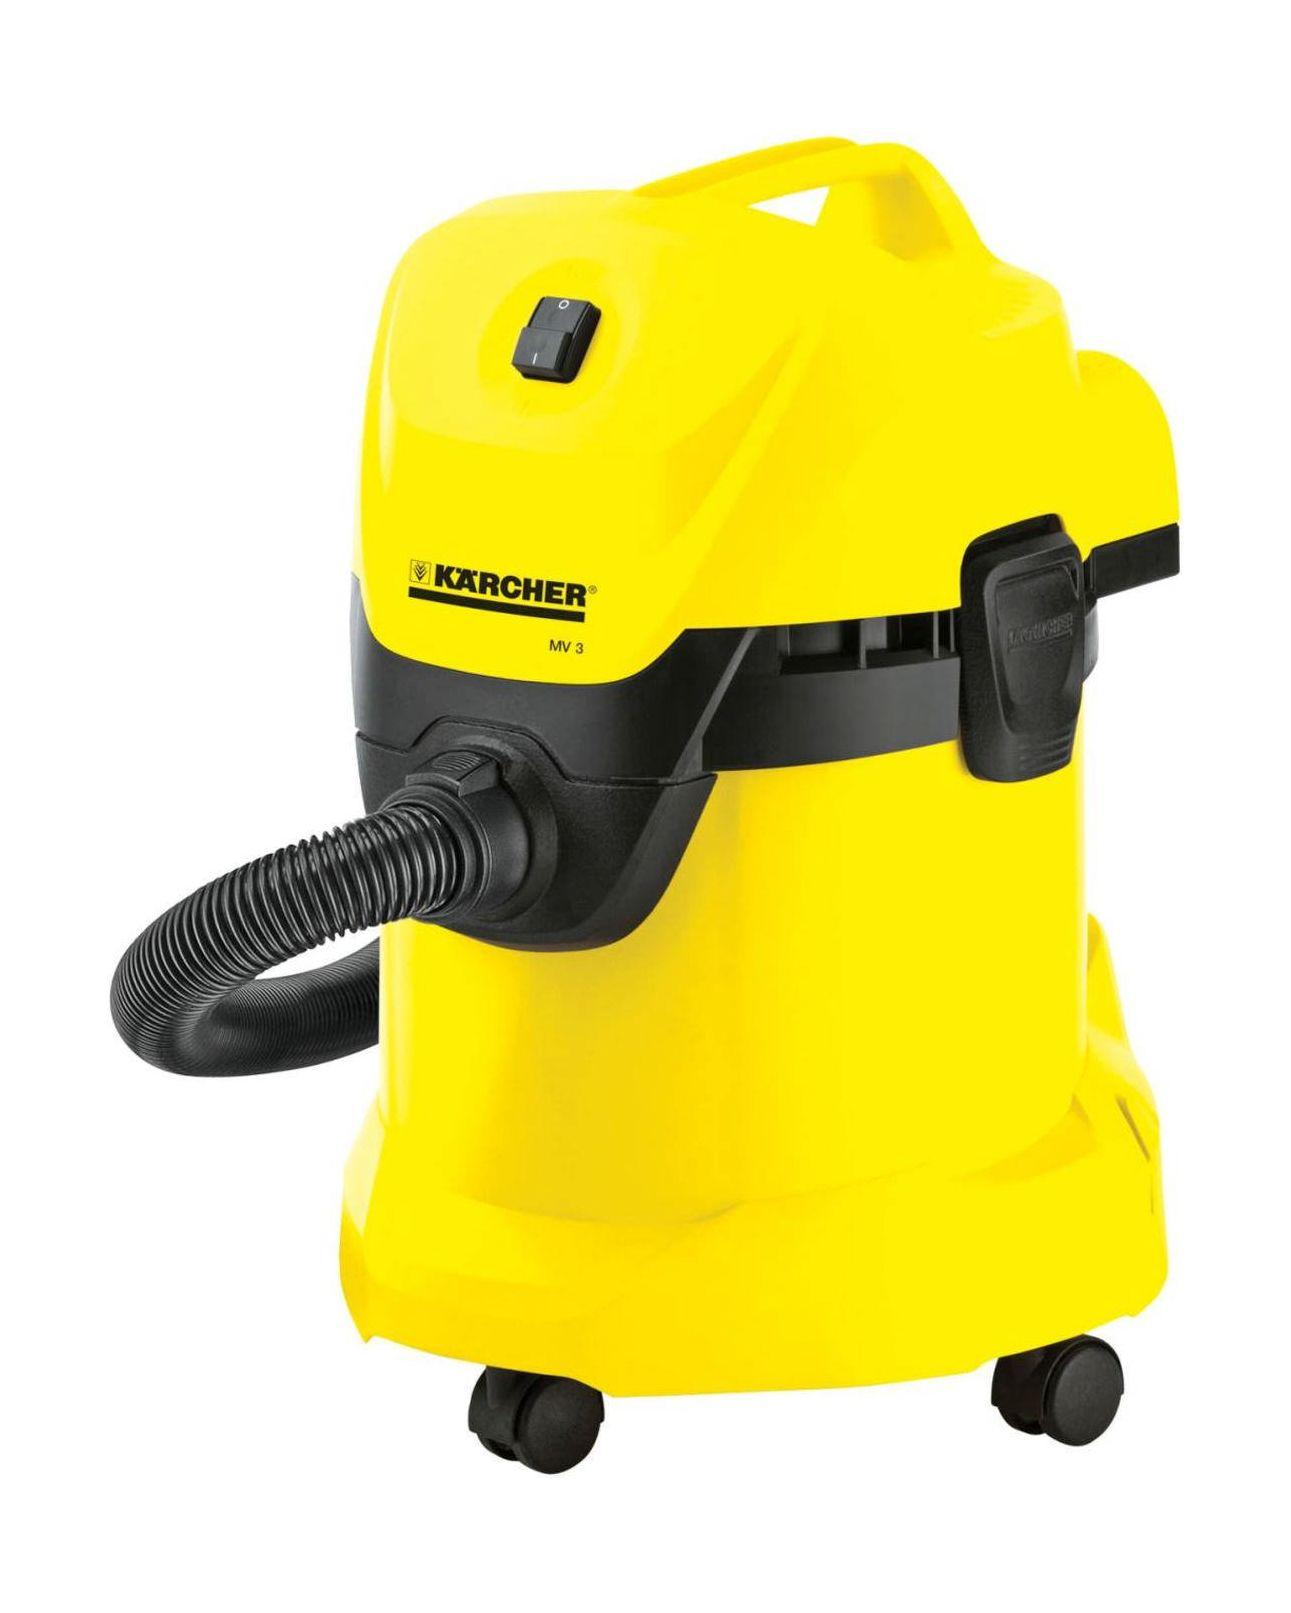 karcher mv3 premium vacuum cleaner 1400 w xcite alghanim electronics best online shopping. Black Bedroom Furniture Sets. Home Design Ideas